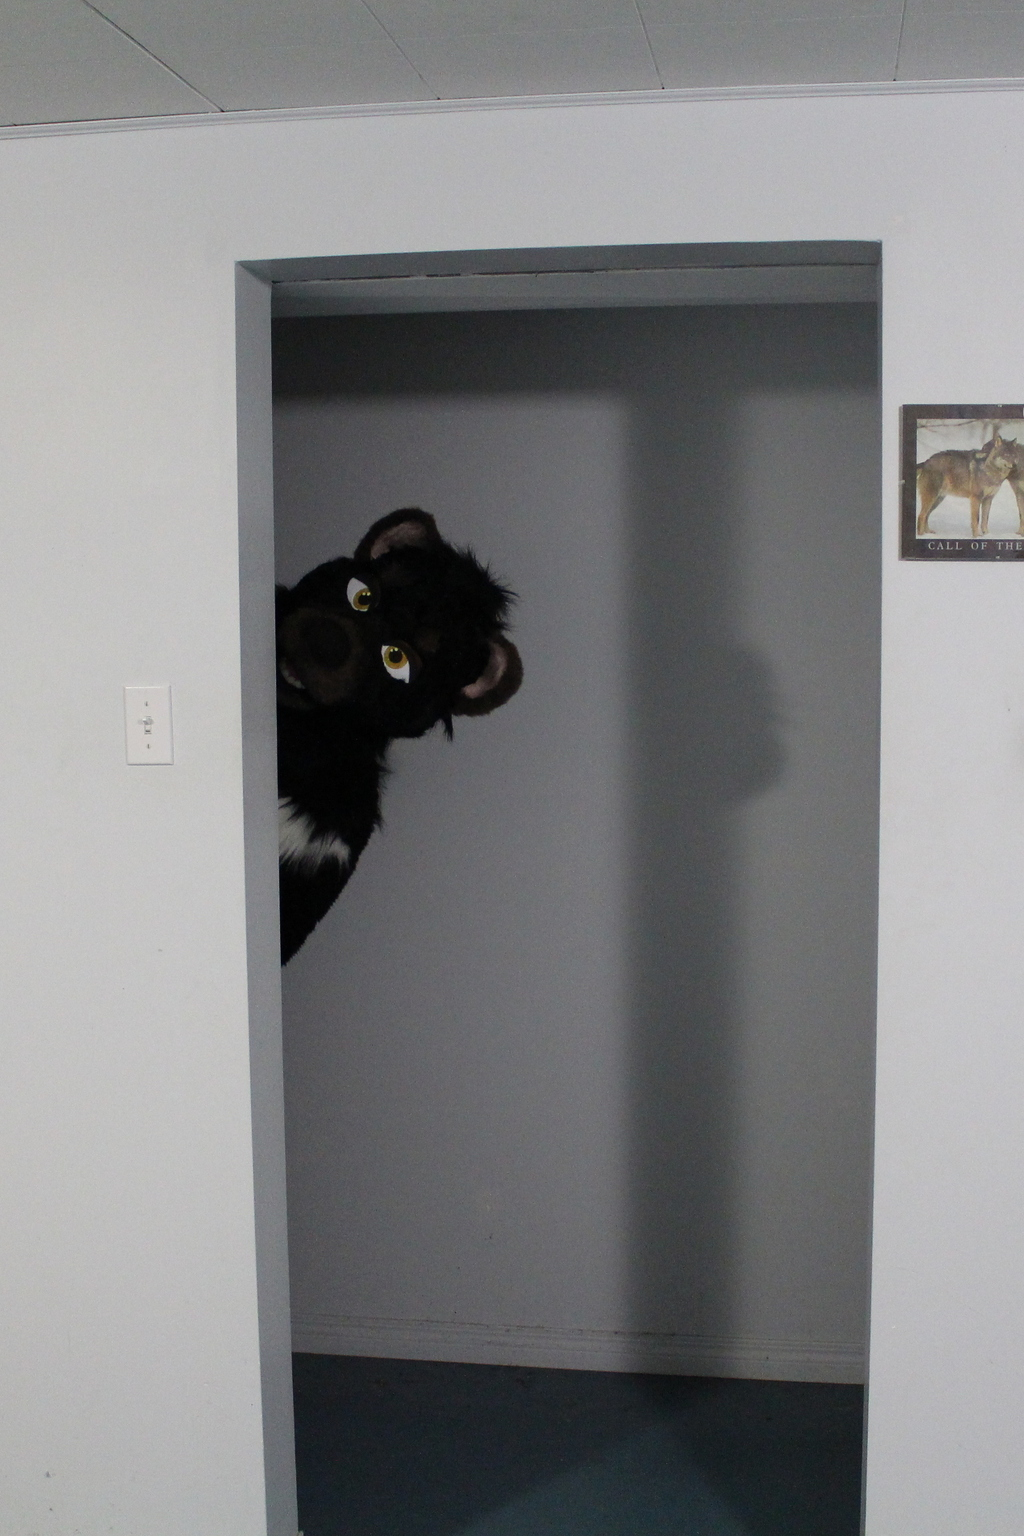 *Peeks around the corner*